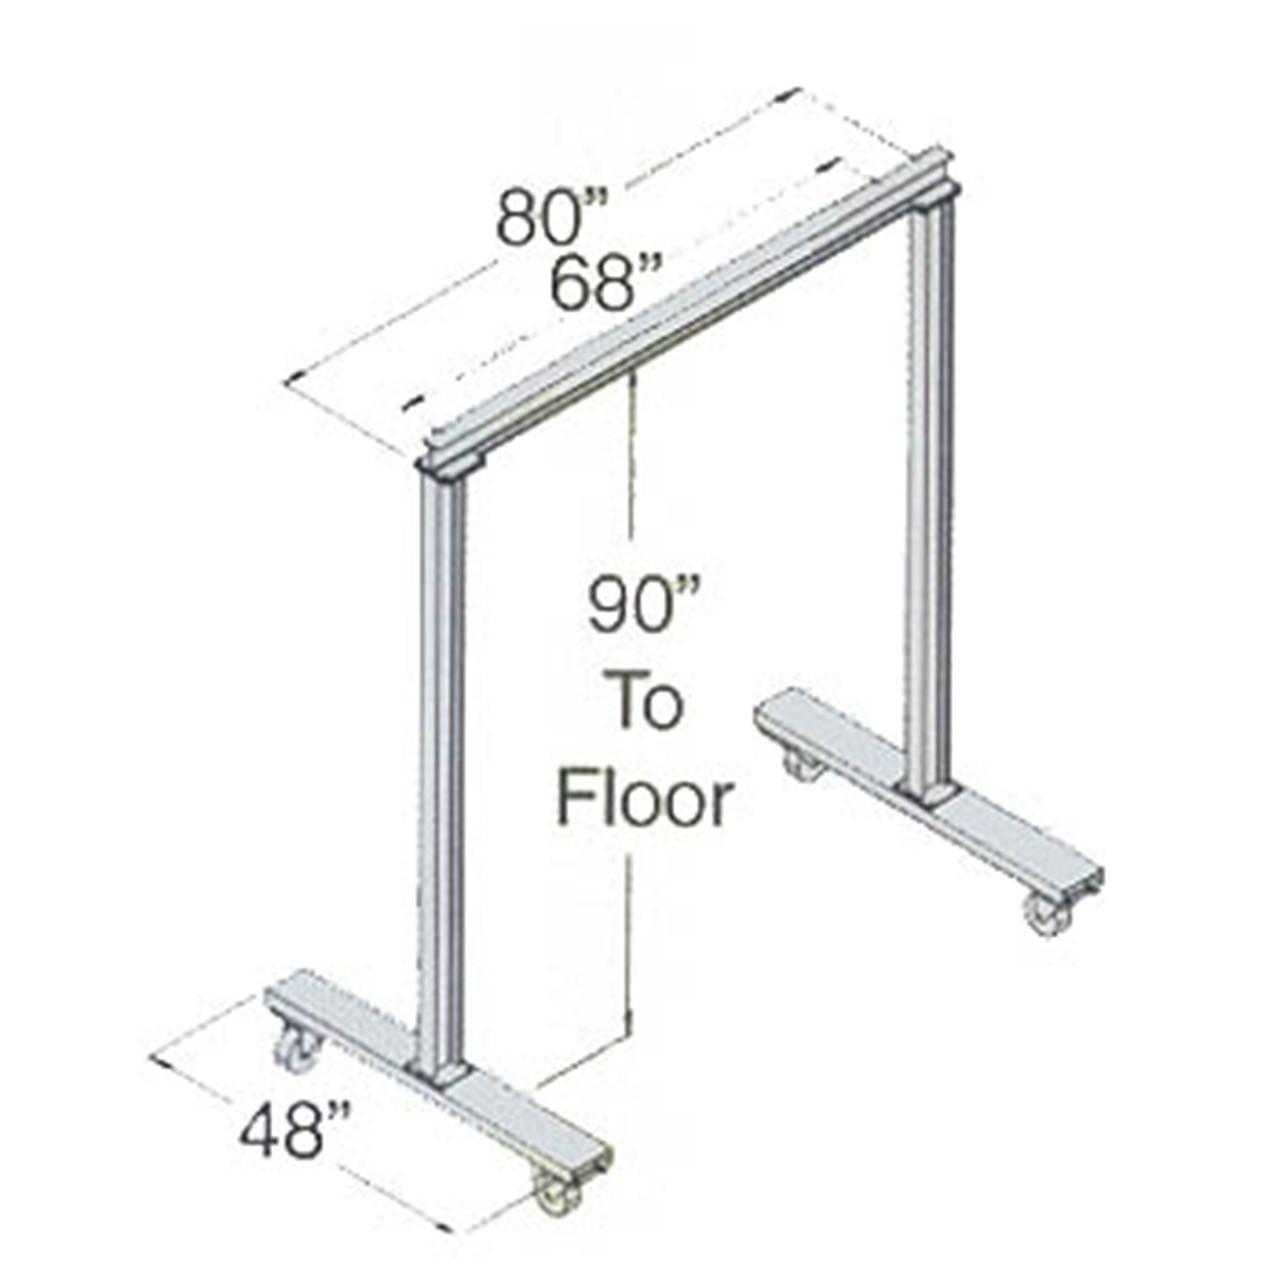 Work Area Portable Steel Gantry Crane Dimensions